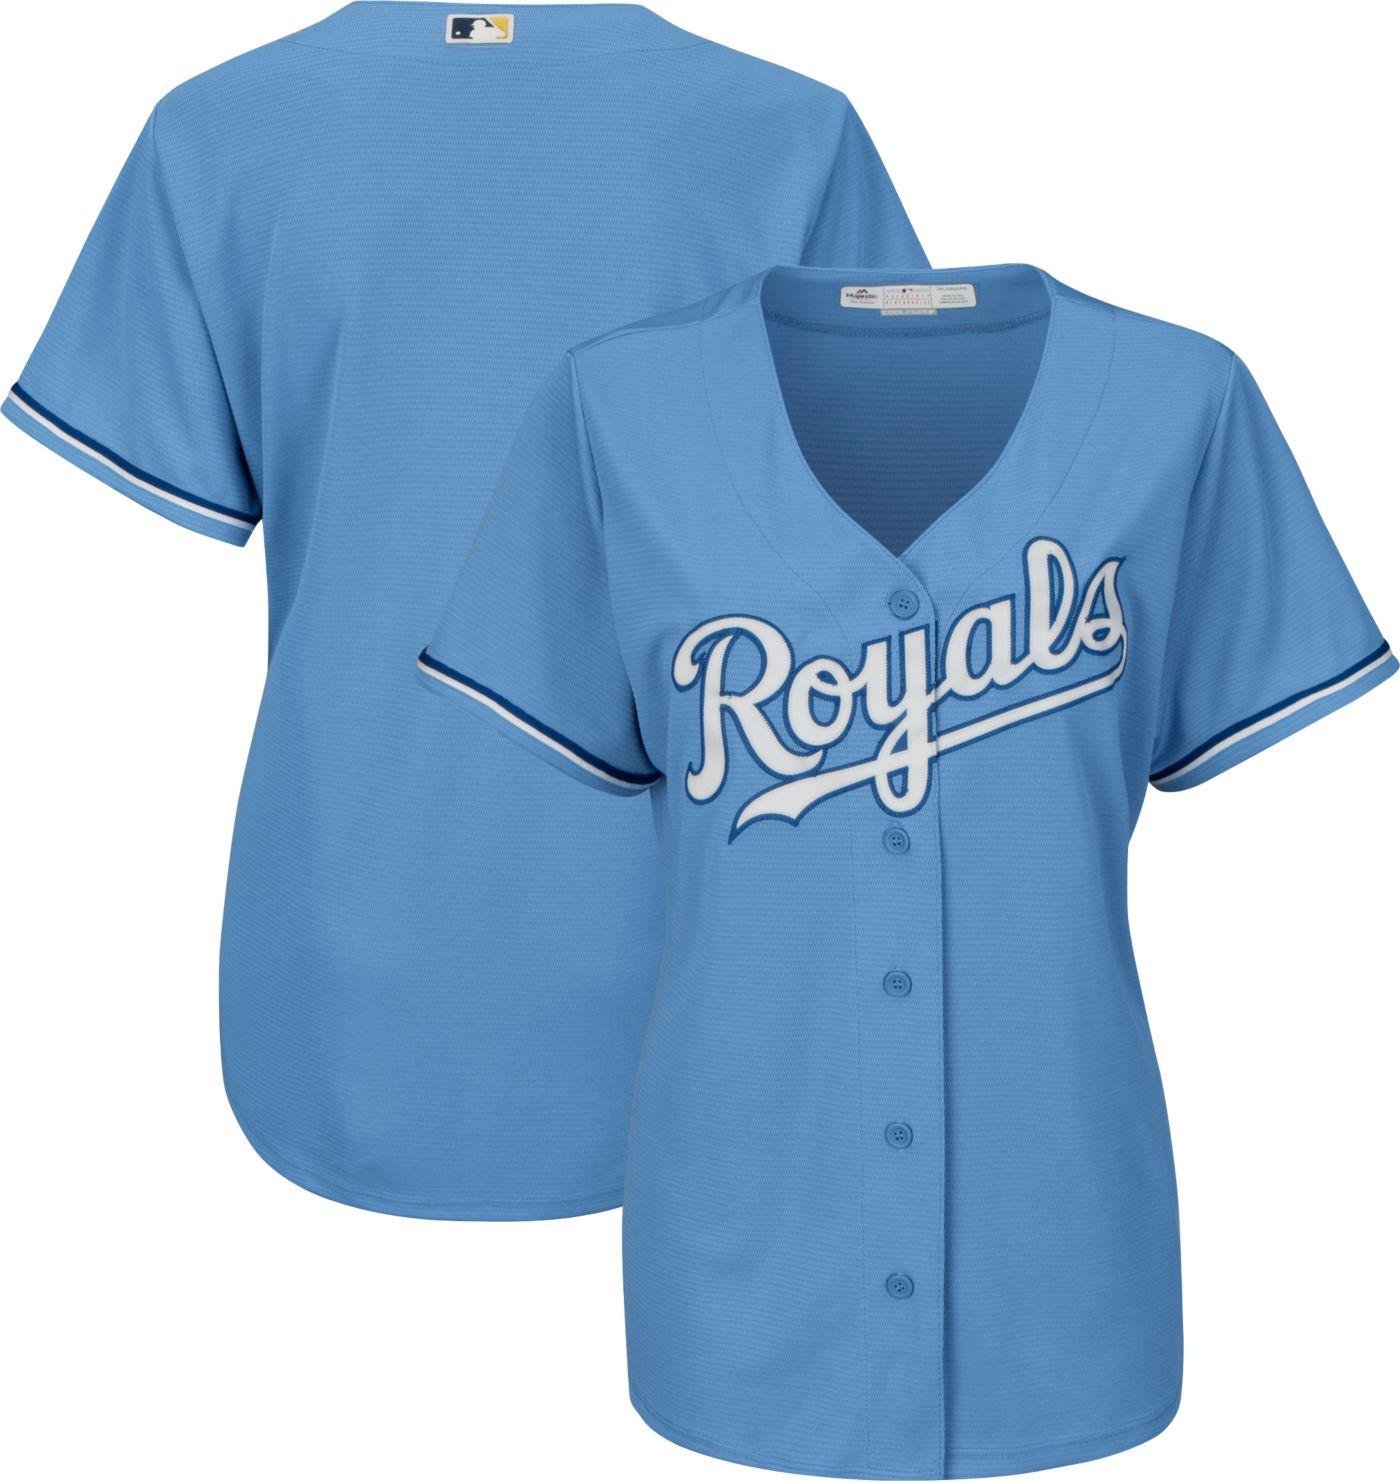 Majestic Women's Replica Kansas City Royals Cool Base Alternate Light Blue Jersey